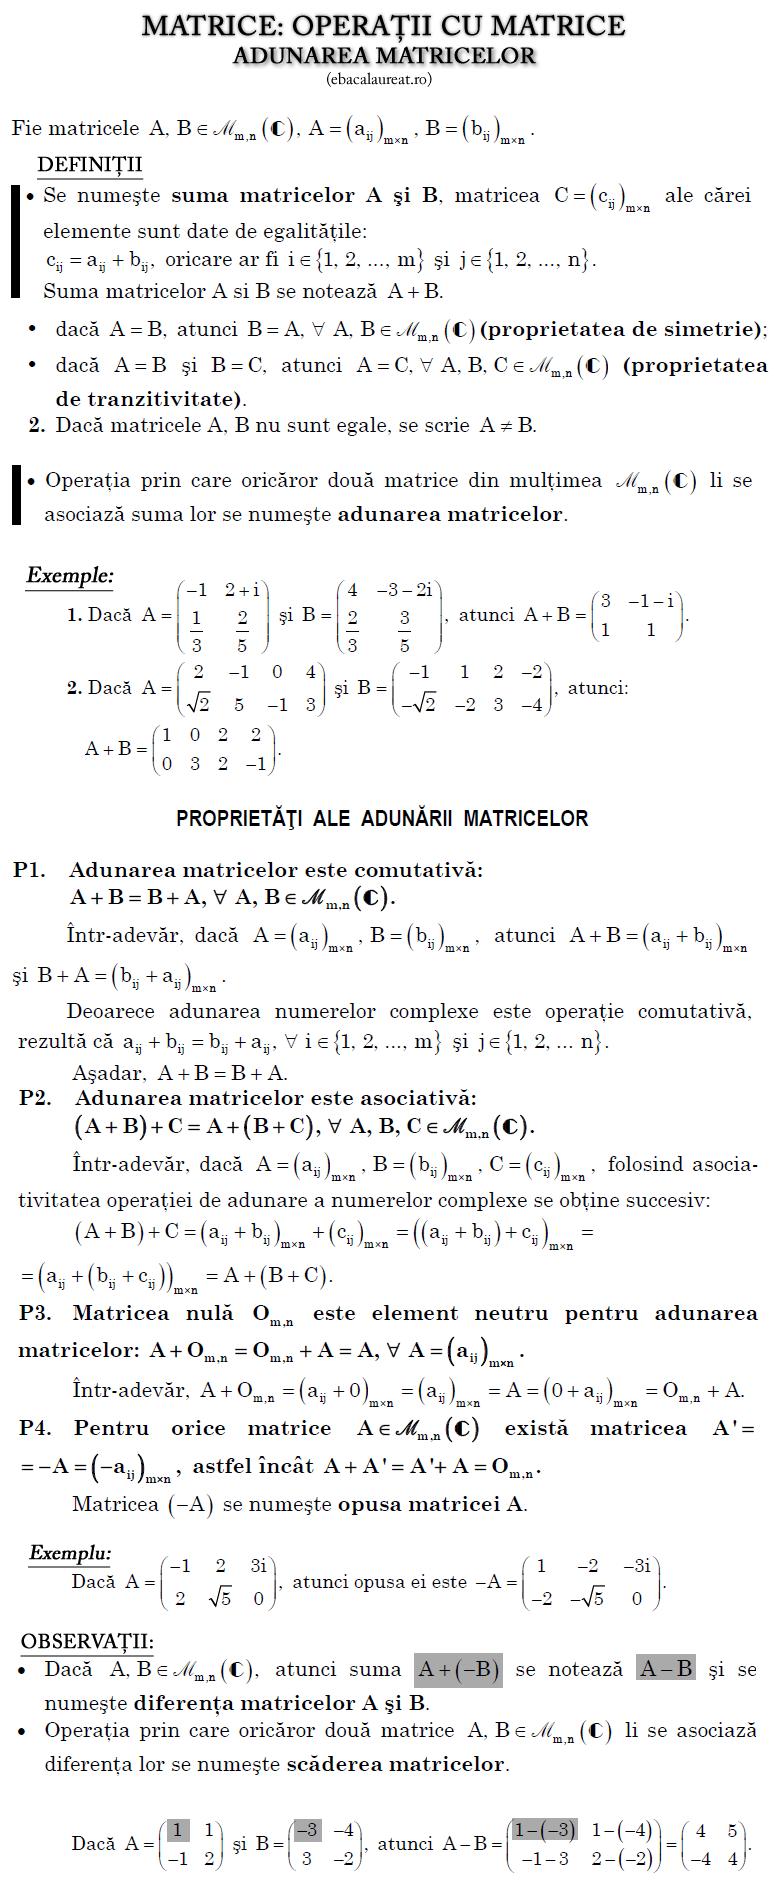 matematica matrice_adunarea_matricelor_ebacalaureat.ro